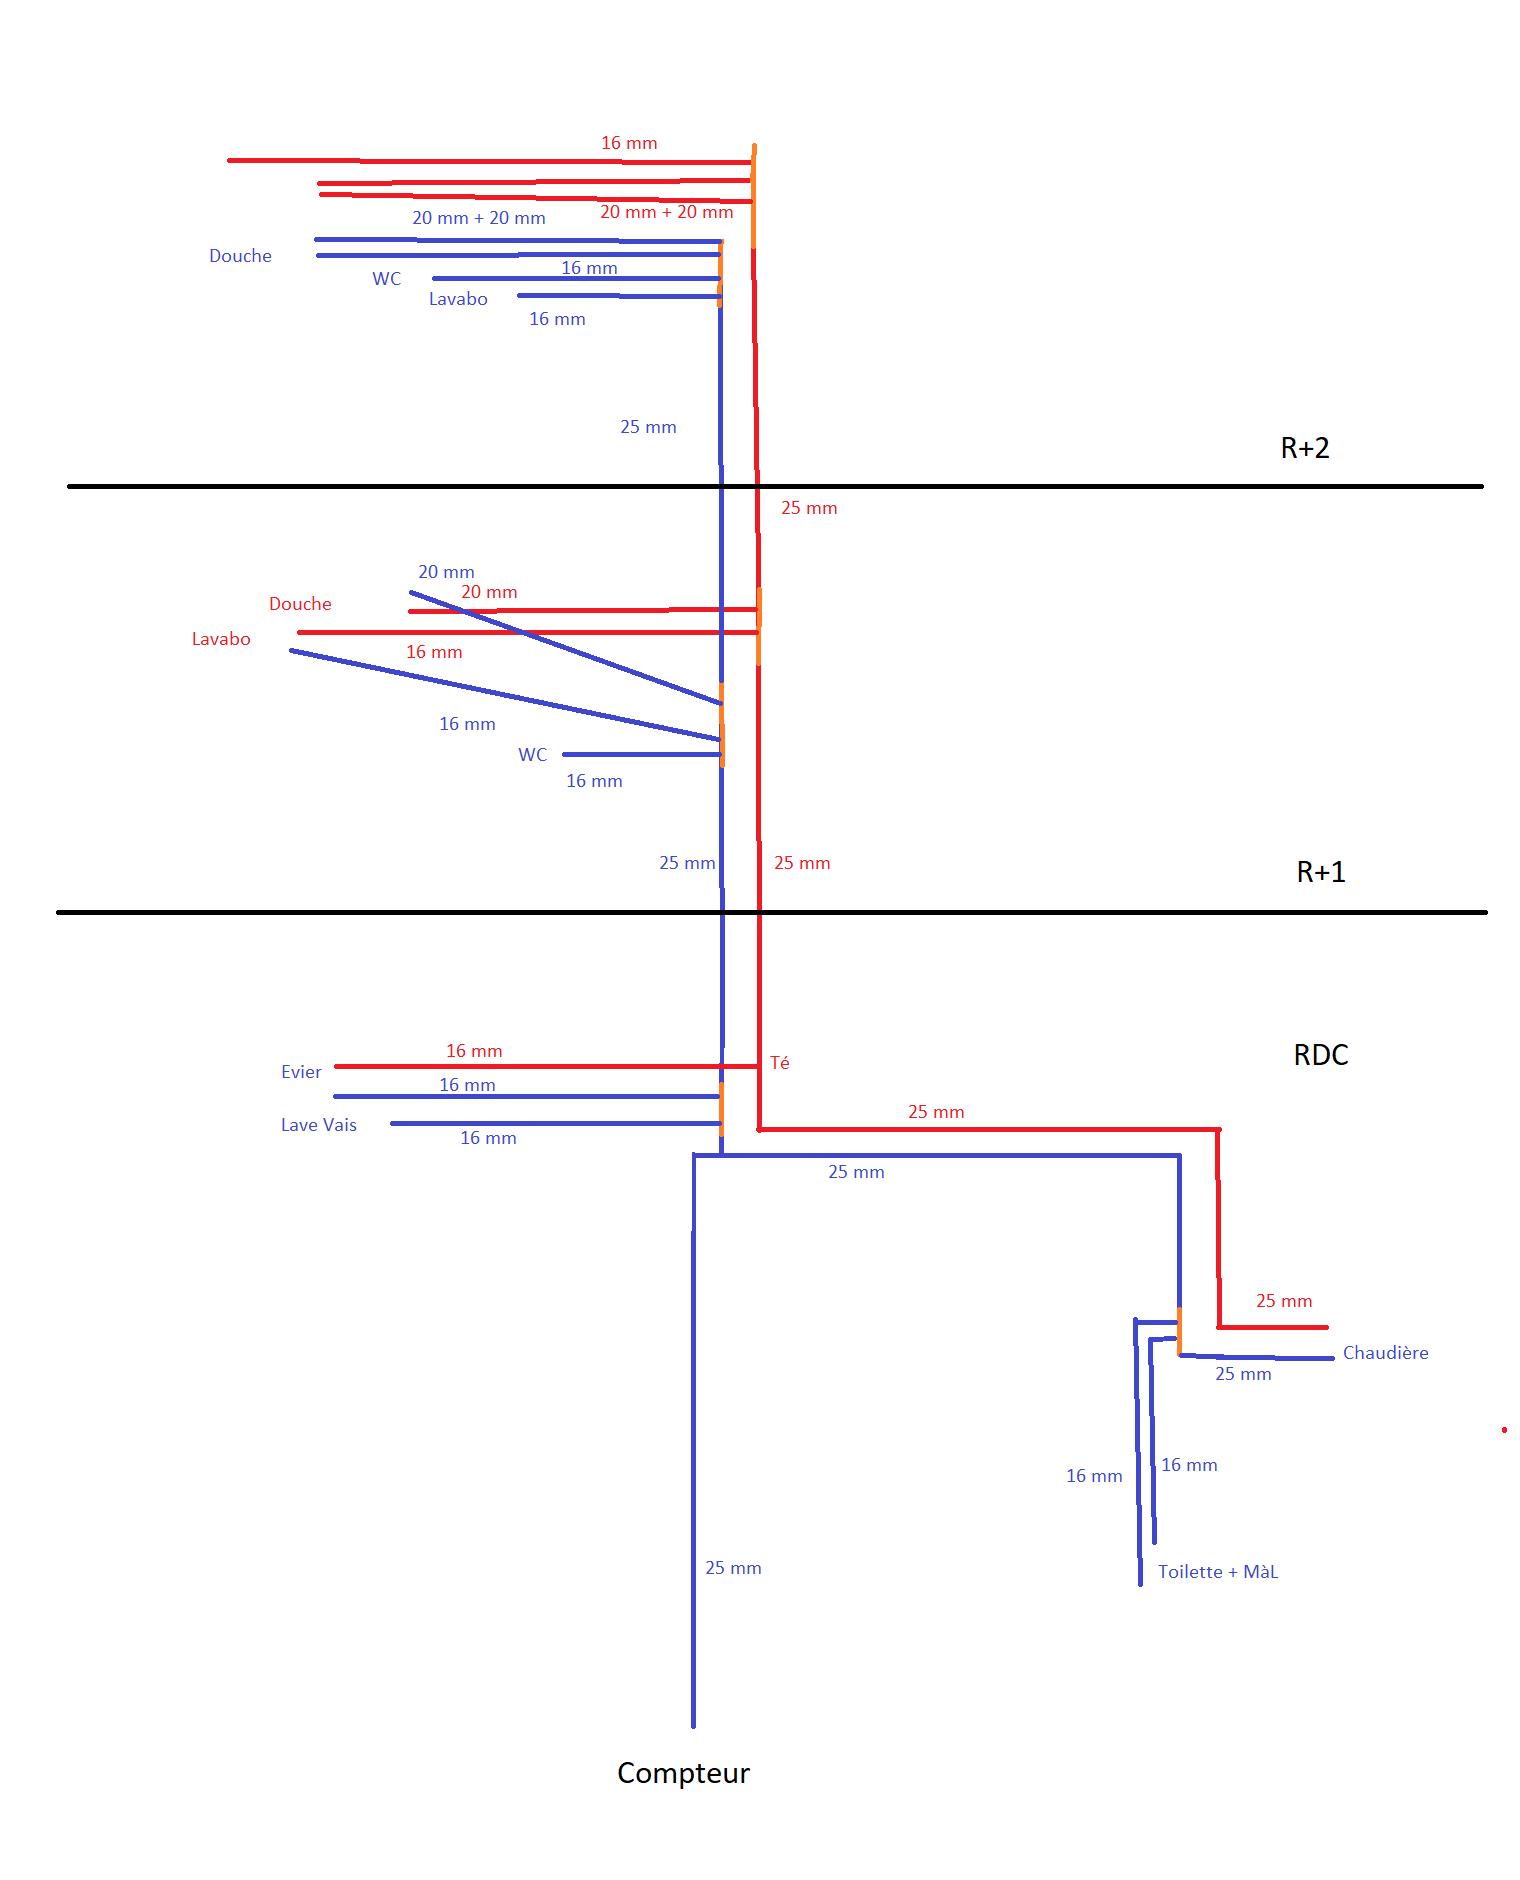 reseau chaudiere avesnes - Copie.png, 42.62 kb, 1520 x 1880